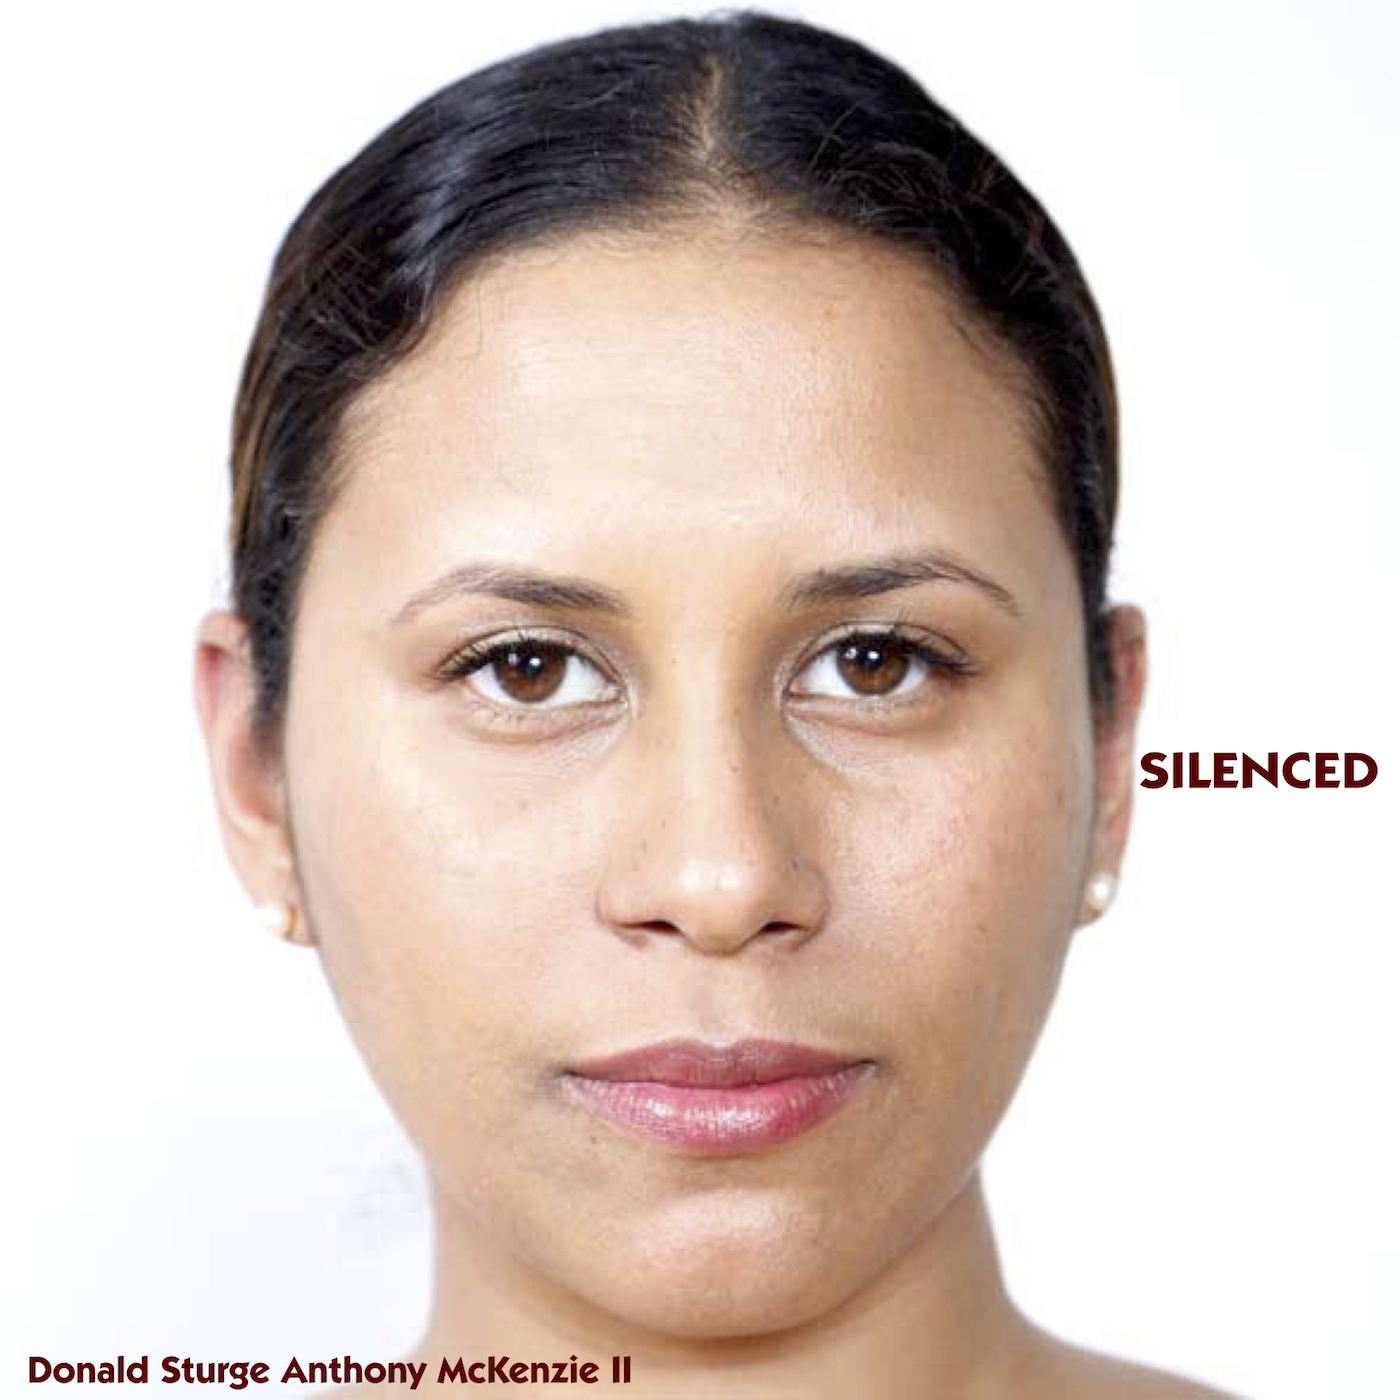 DONALD STURGE ANTHONY MCKENZIE II SILENCED FEAT. NELS CLINE, MELVIN GIBBS, VERNON REID PRE-ORDER SOON